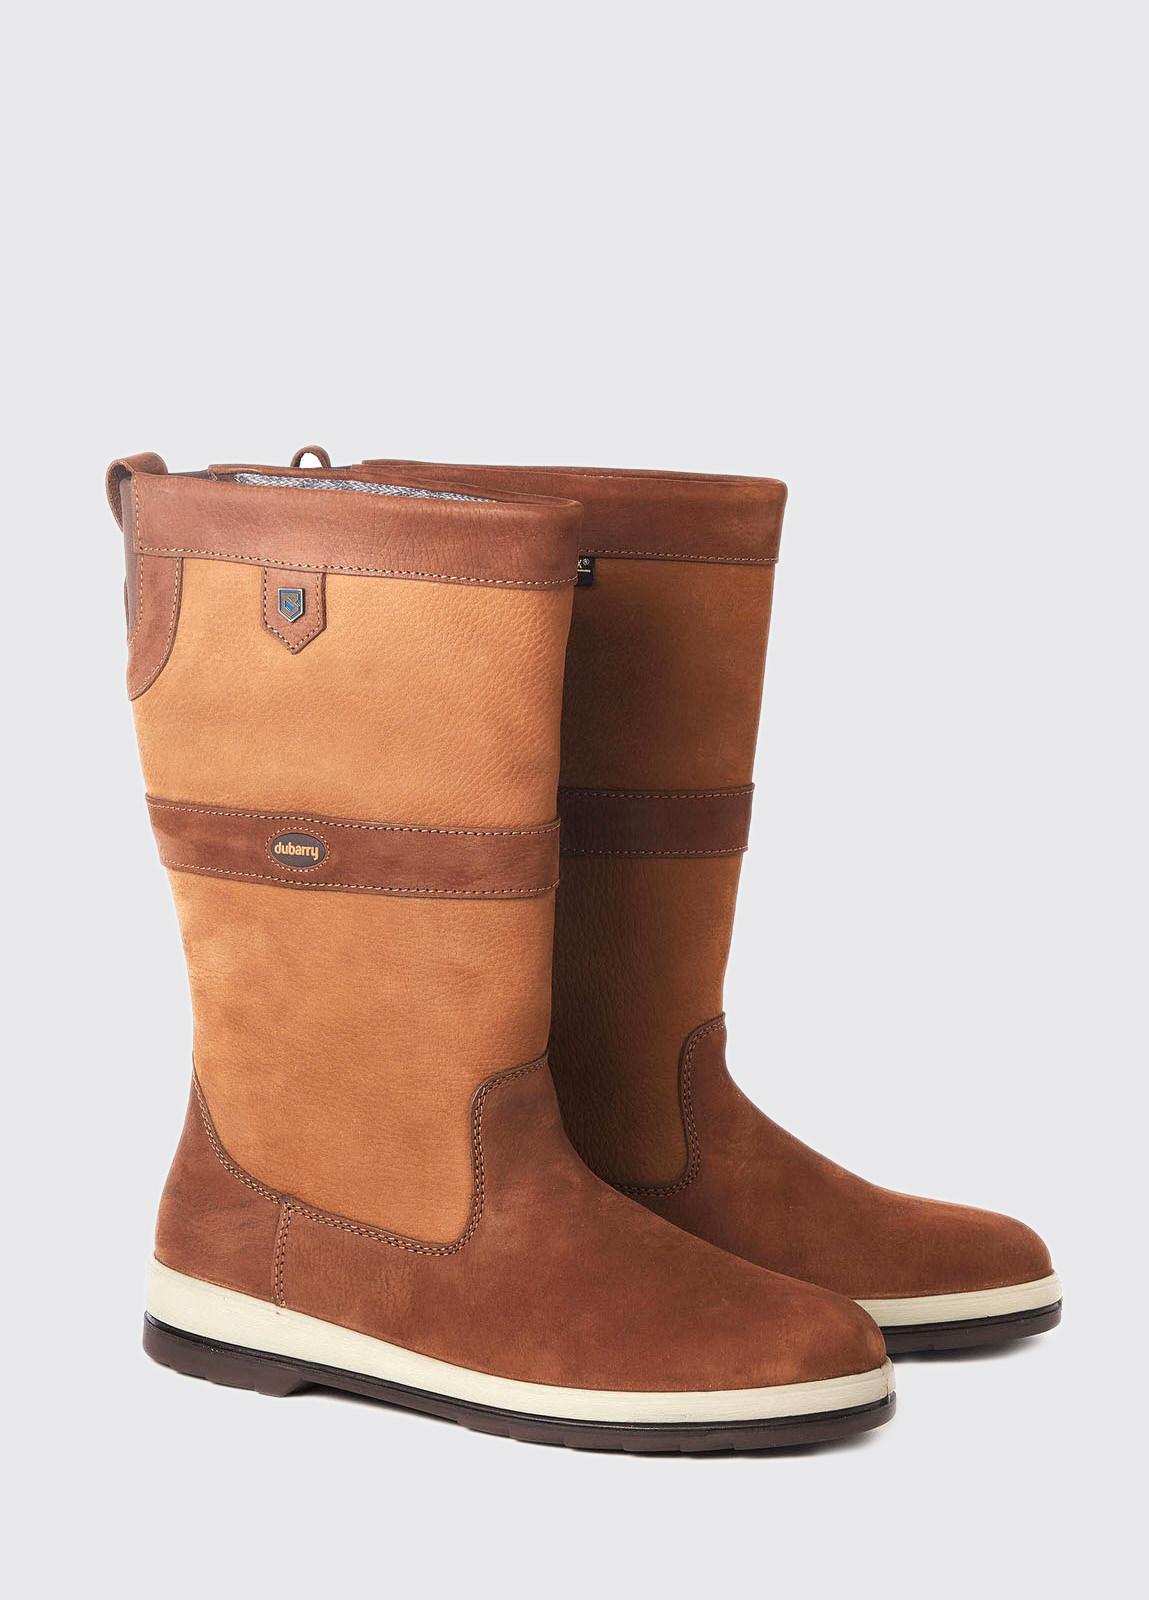 Ultima Sailing Boot - Brown